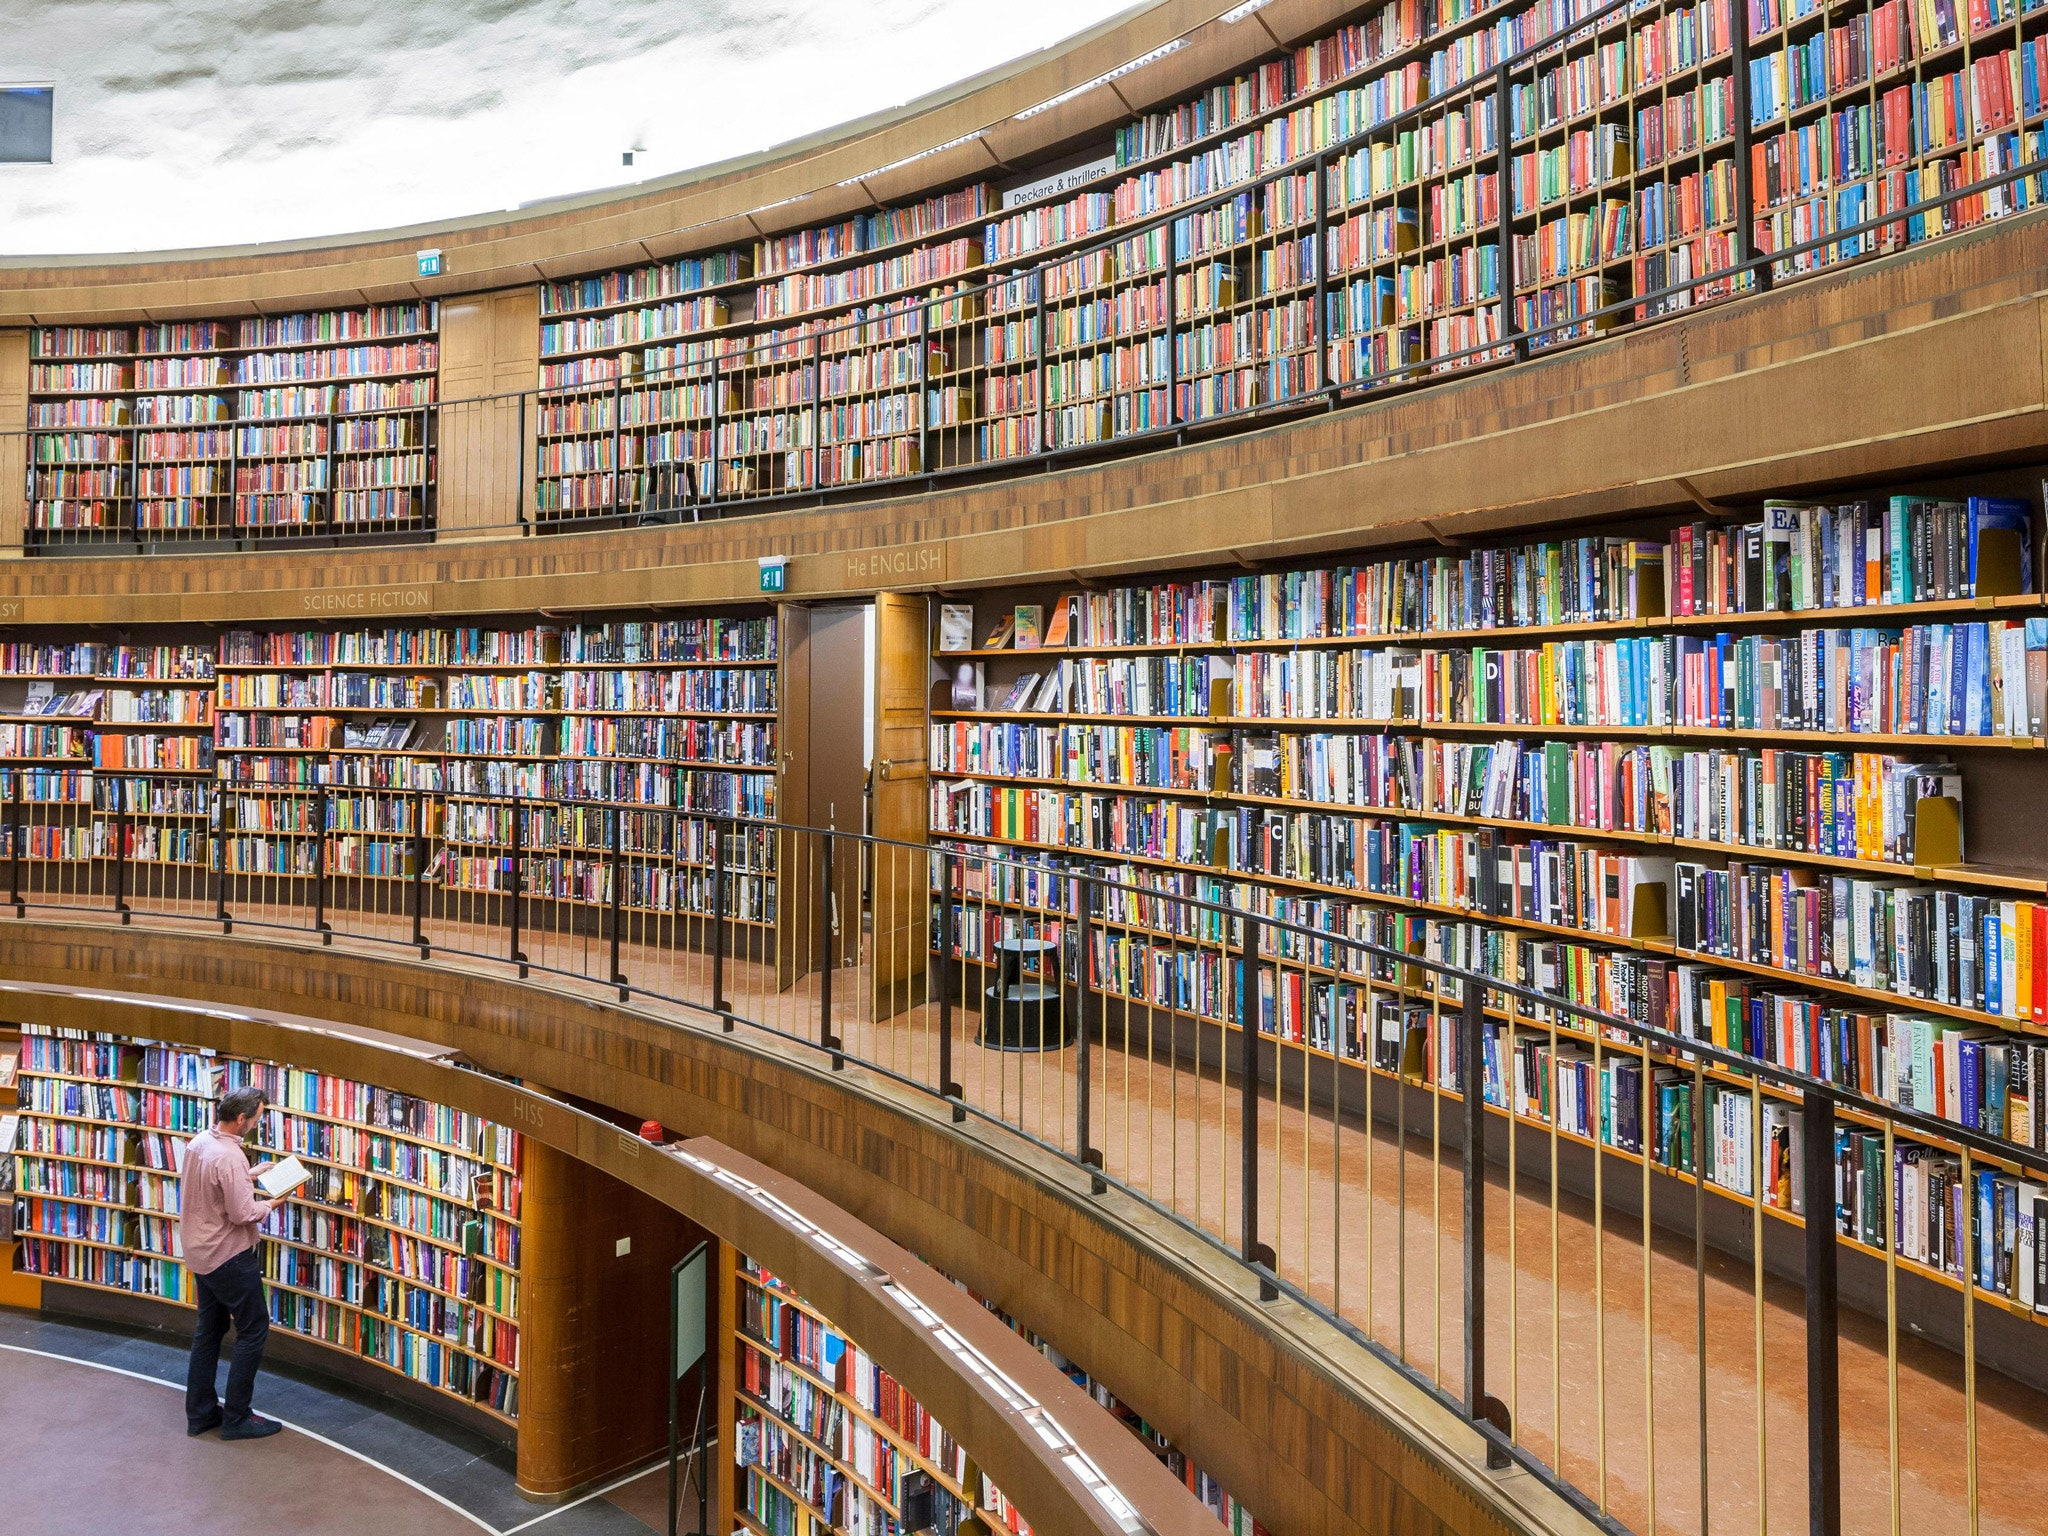 stockholm-public-library-alamy